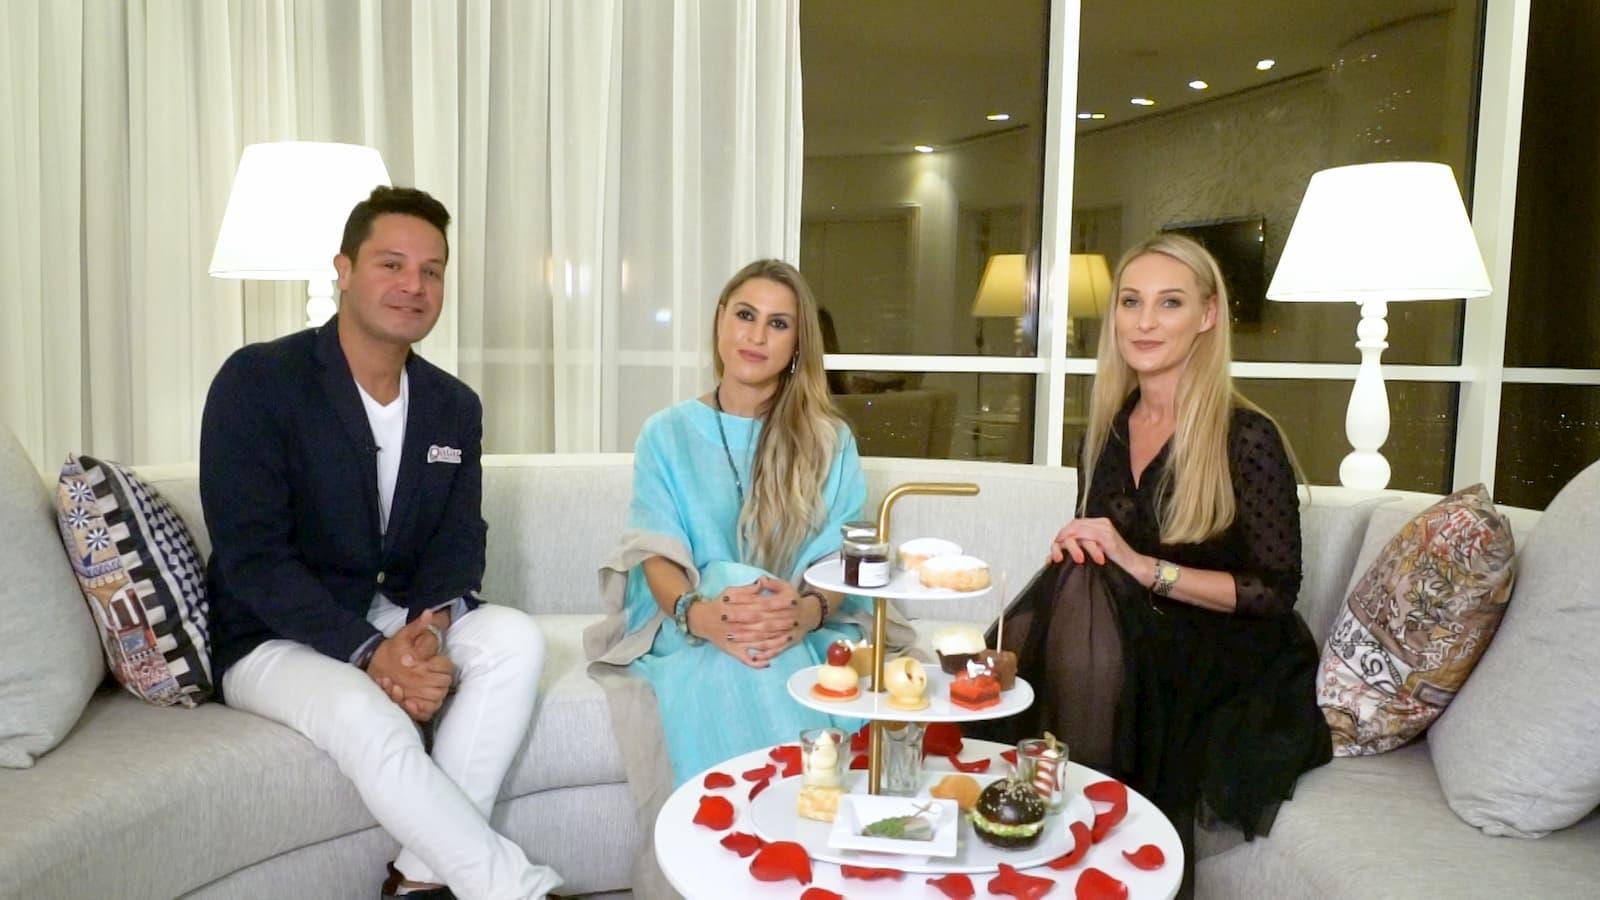 WATCH: QL Exclusive - Dana Al Fardan